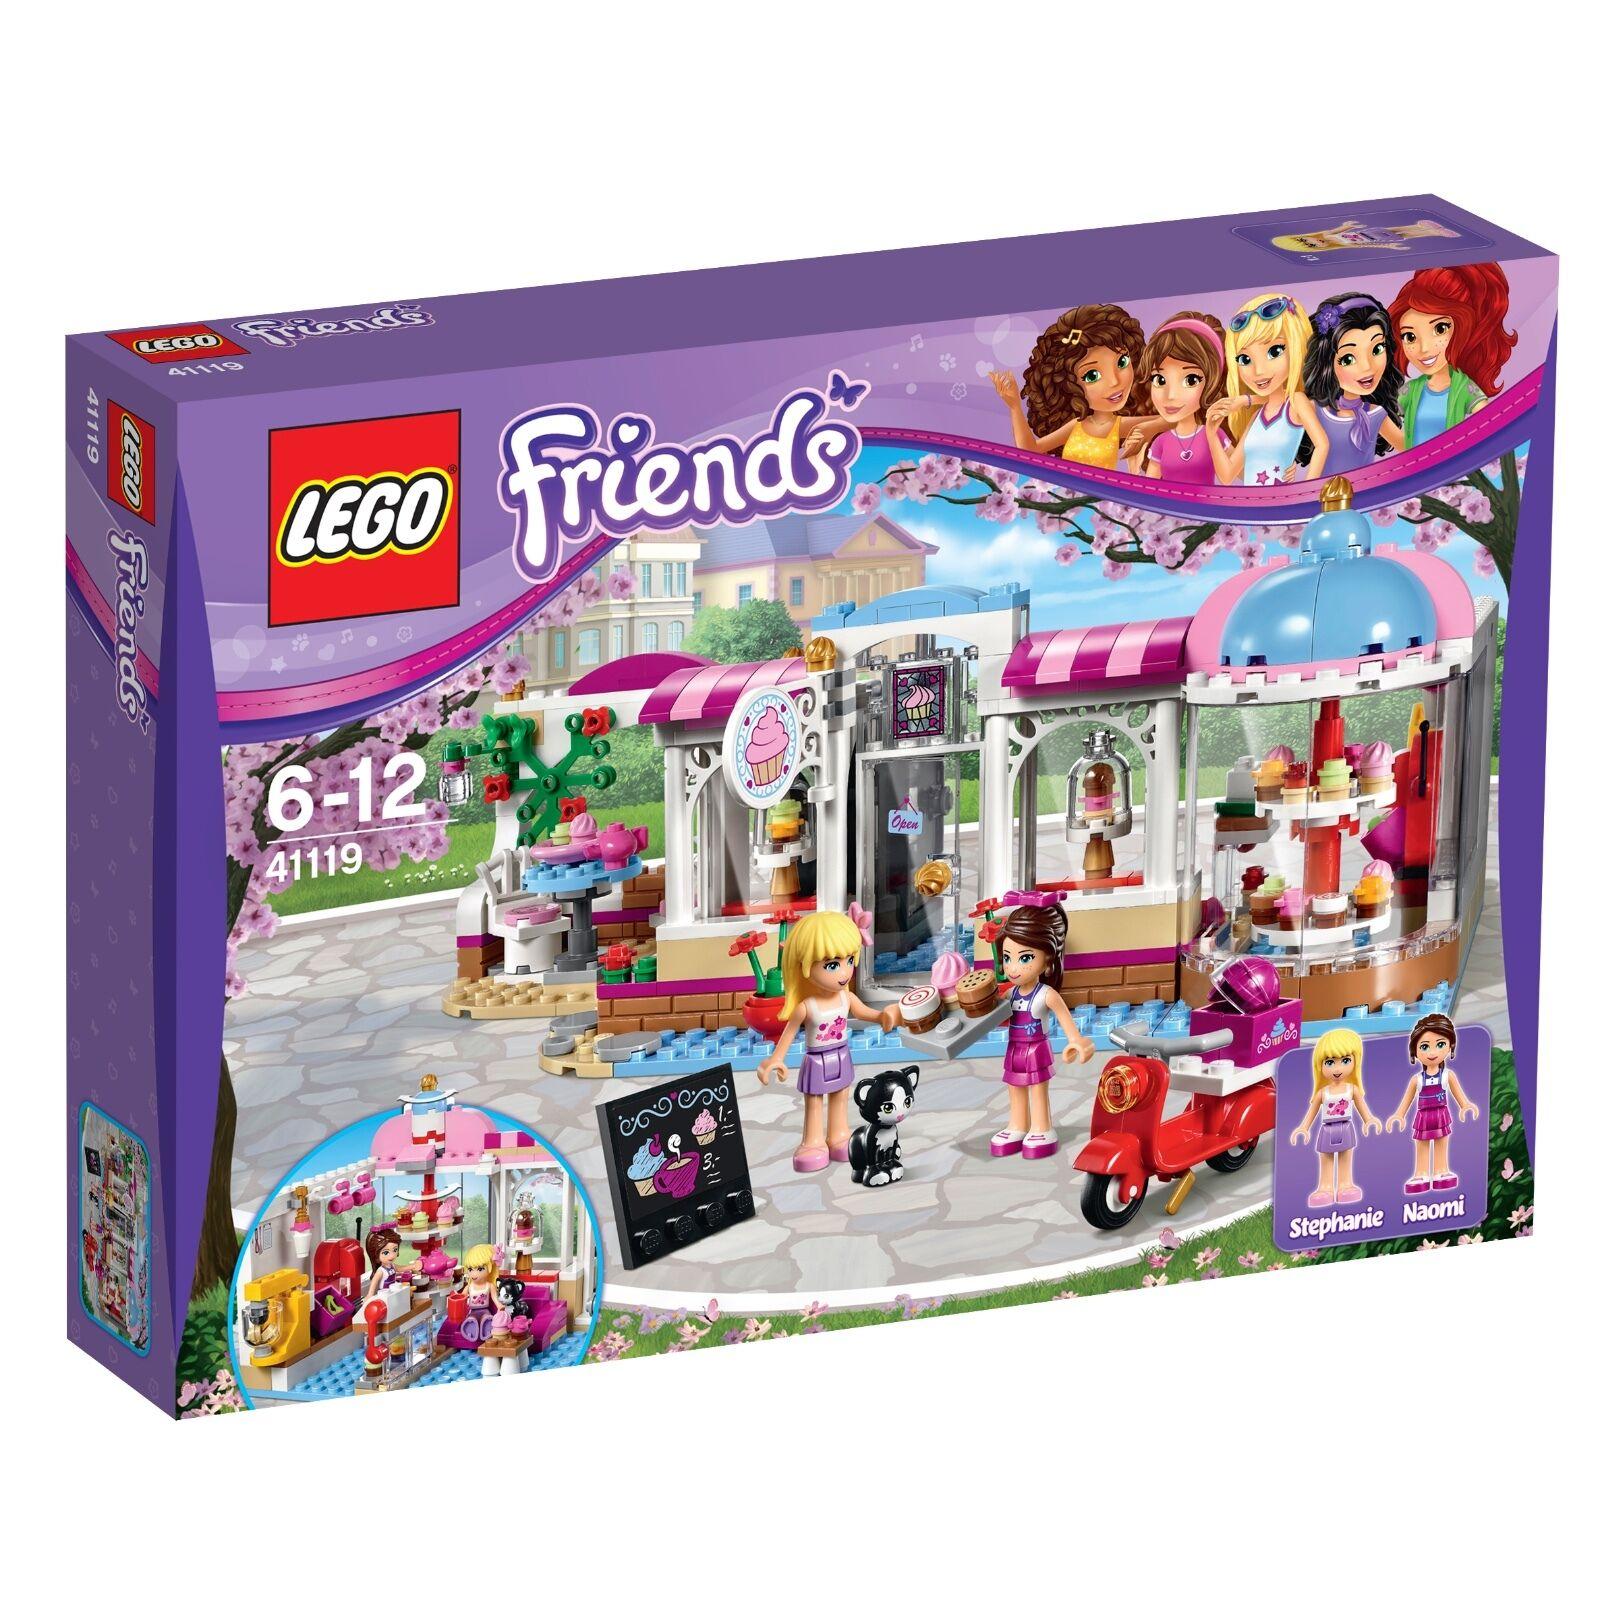 LEGO ® Friends 41119 Heartlake Cupcake-Café NEUF neuf dans sa boîte NEW En parfait état, dans sa boîte scellée Boîte d'origine jamais ouverte